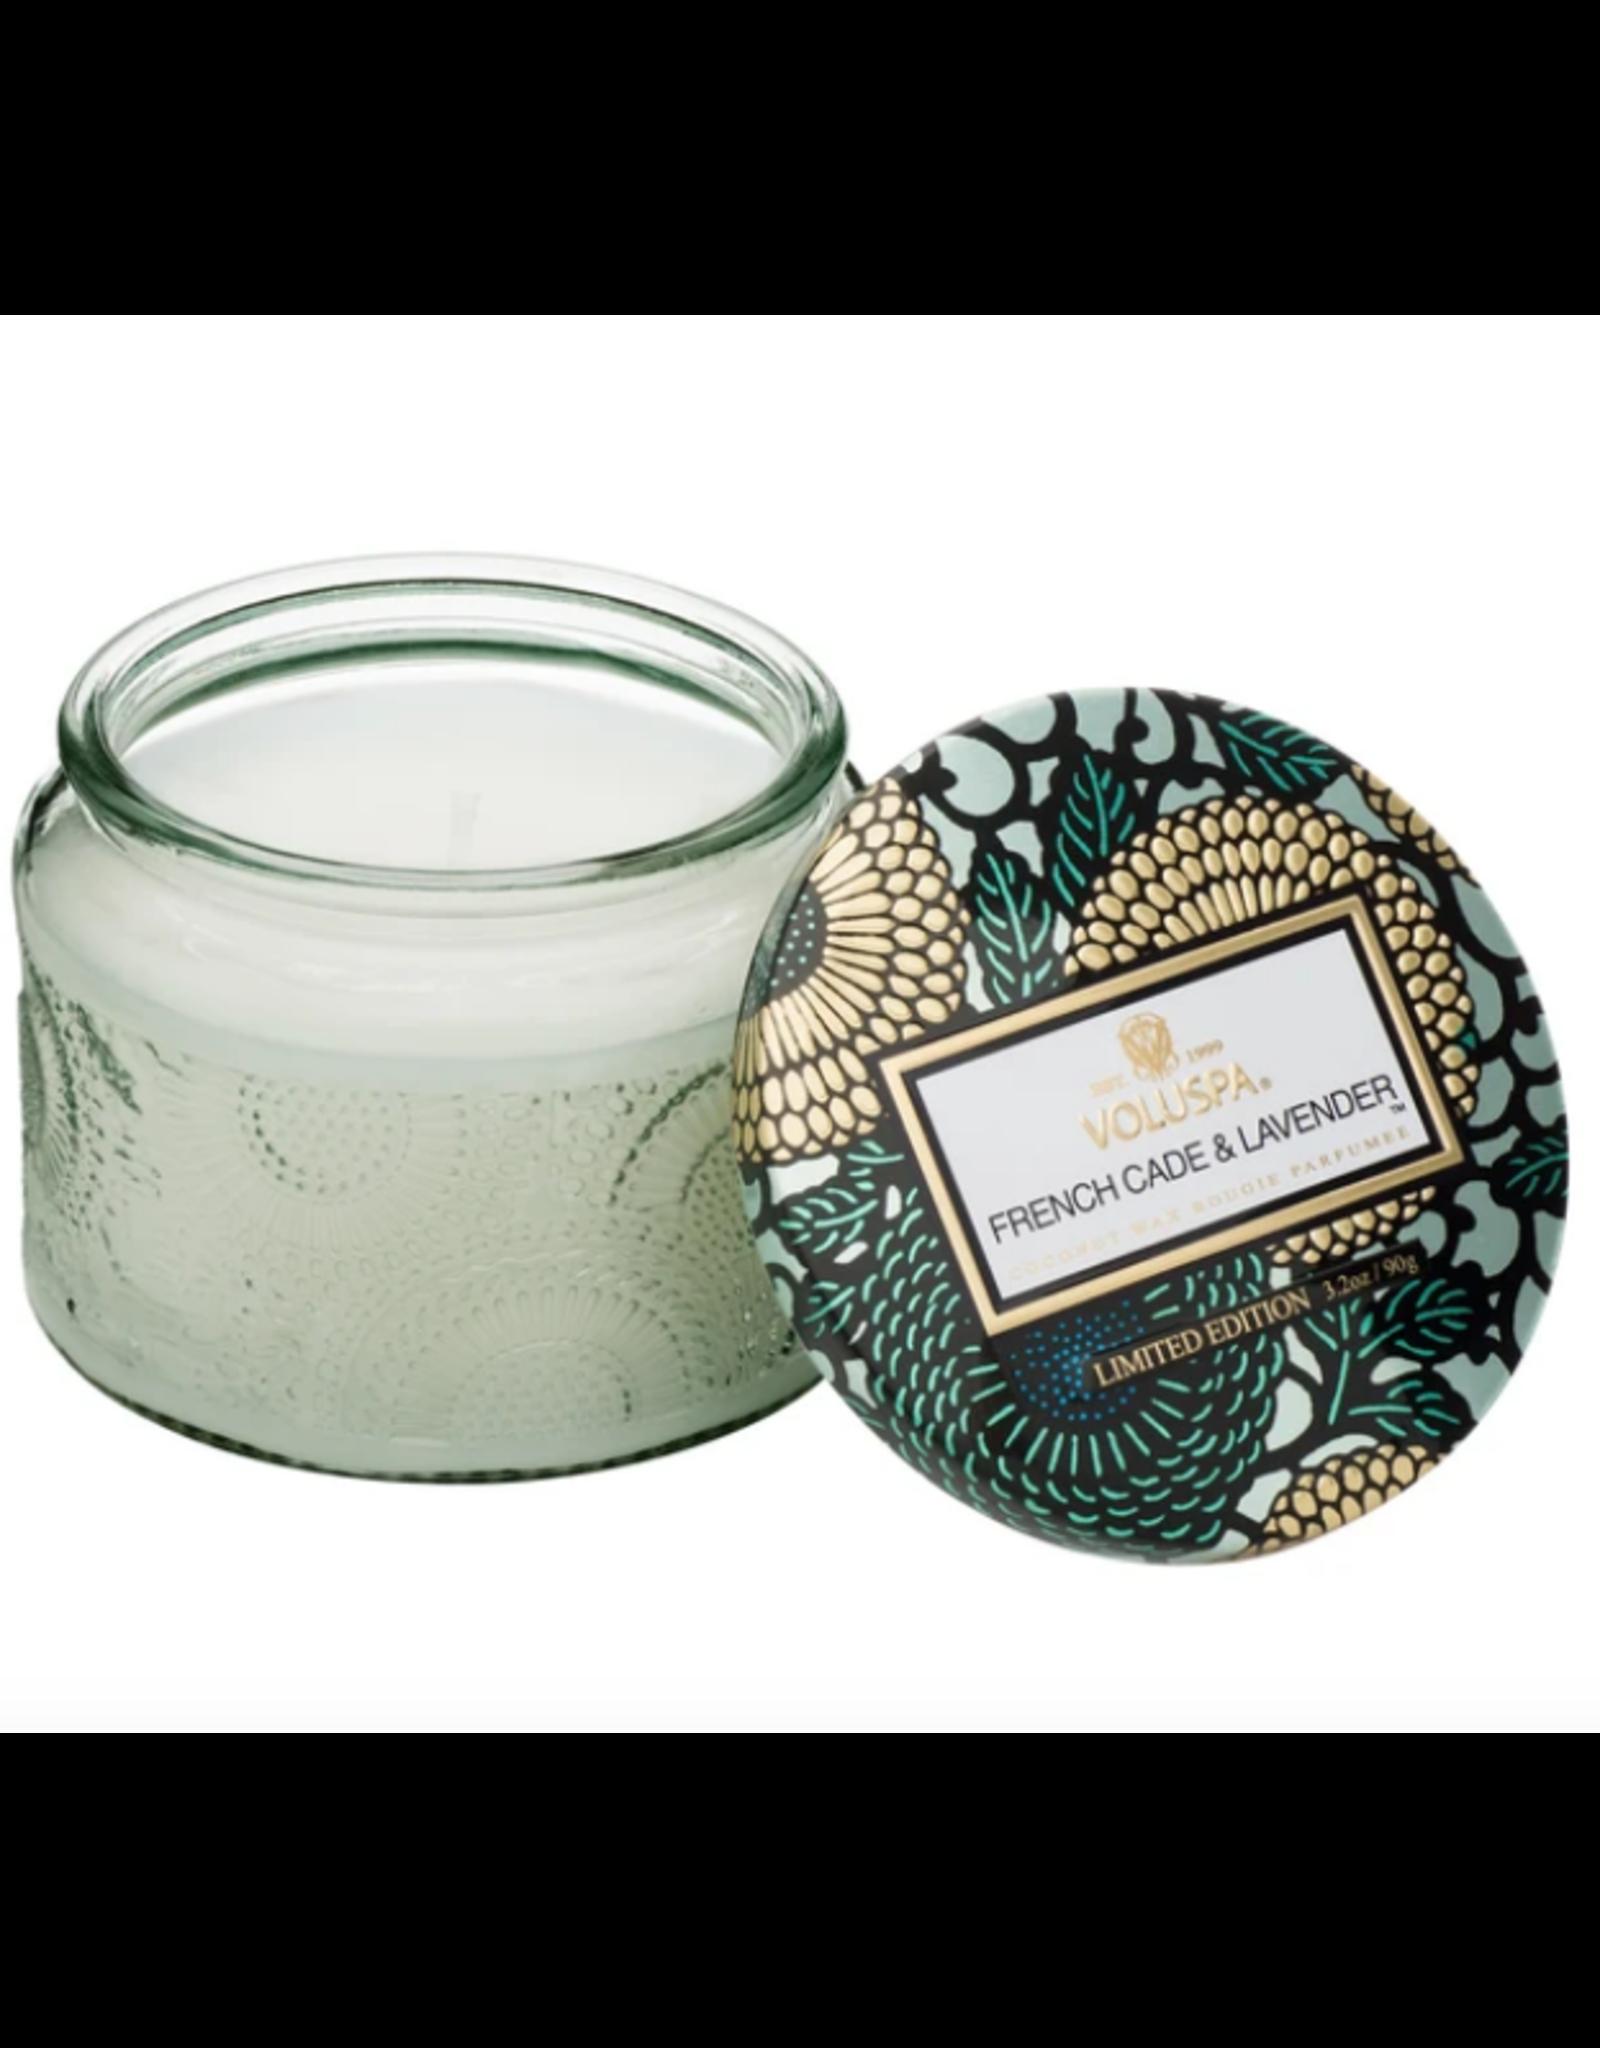 Voluspa French Cade Lavender Petite Glass Jar Candle